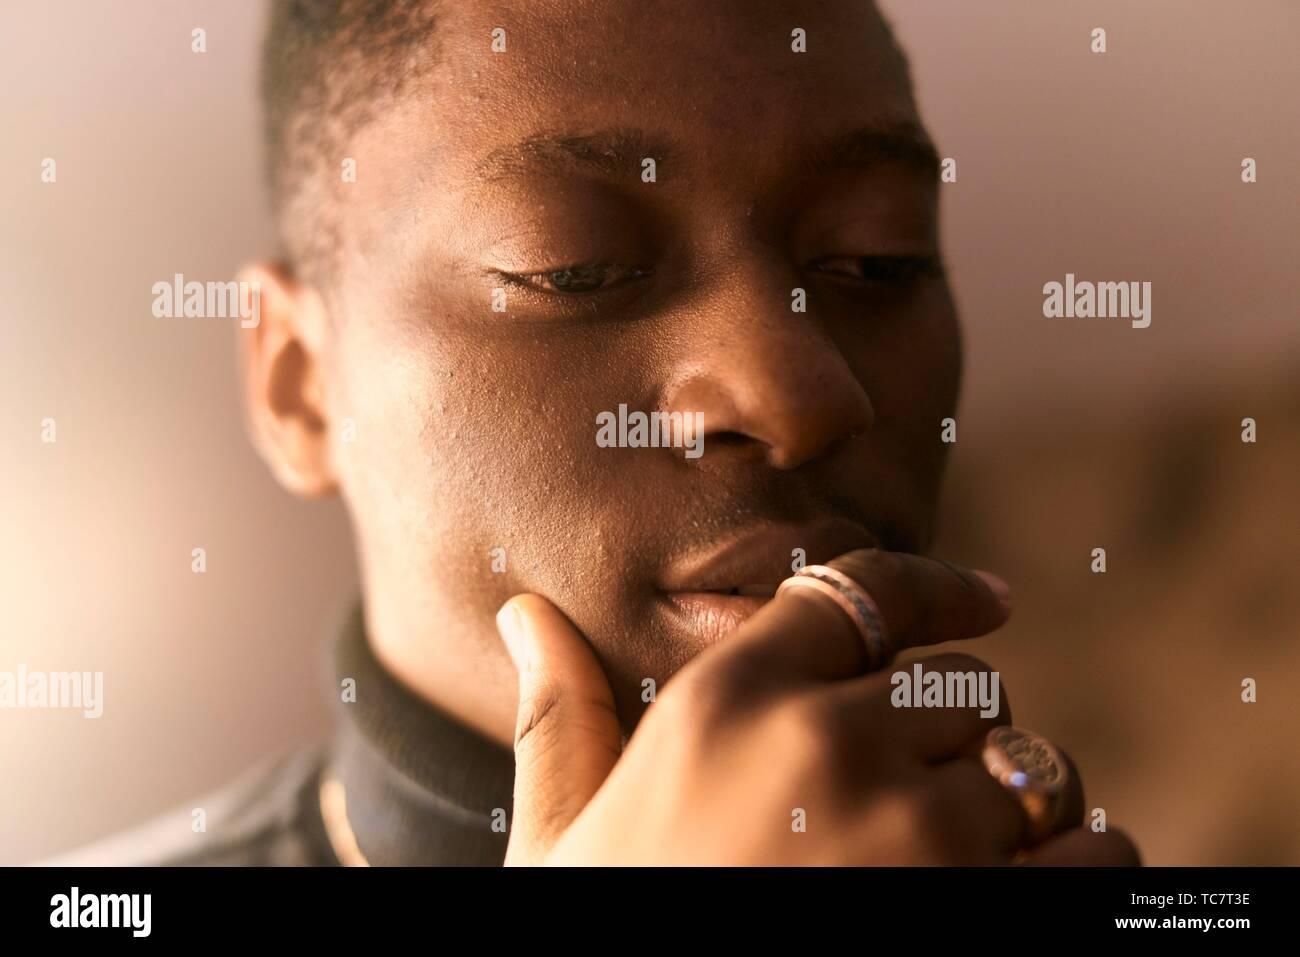 thoughtful young man, hand fondling lips, in Munich, Germany. Stock Photo